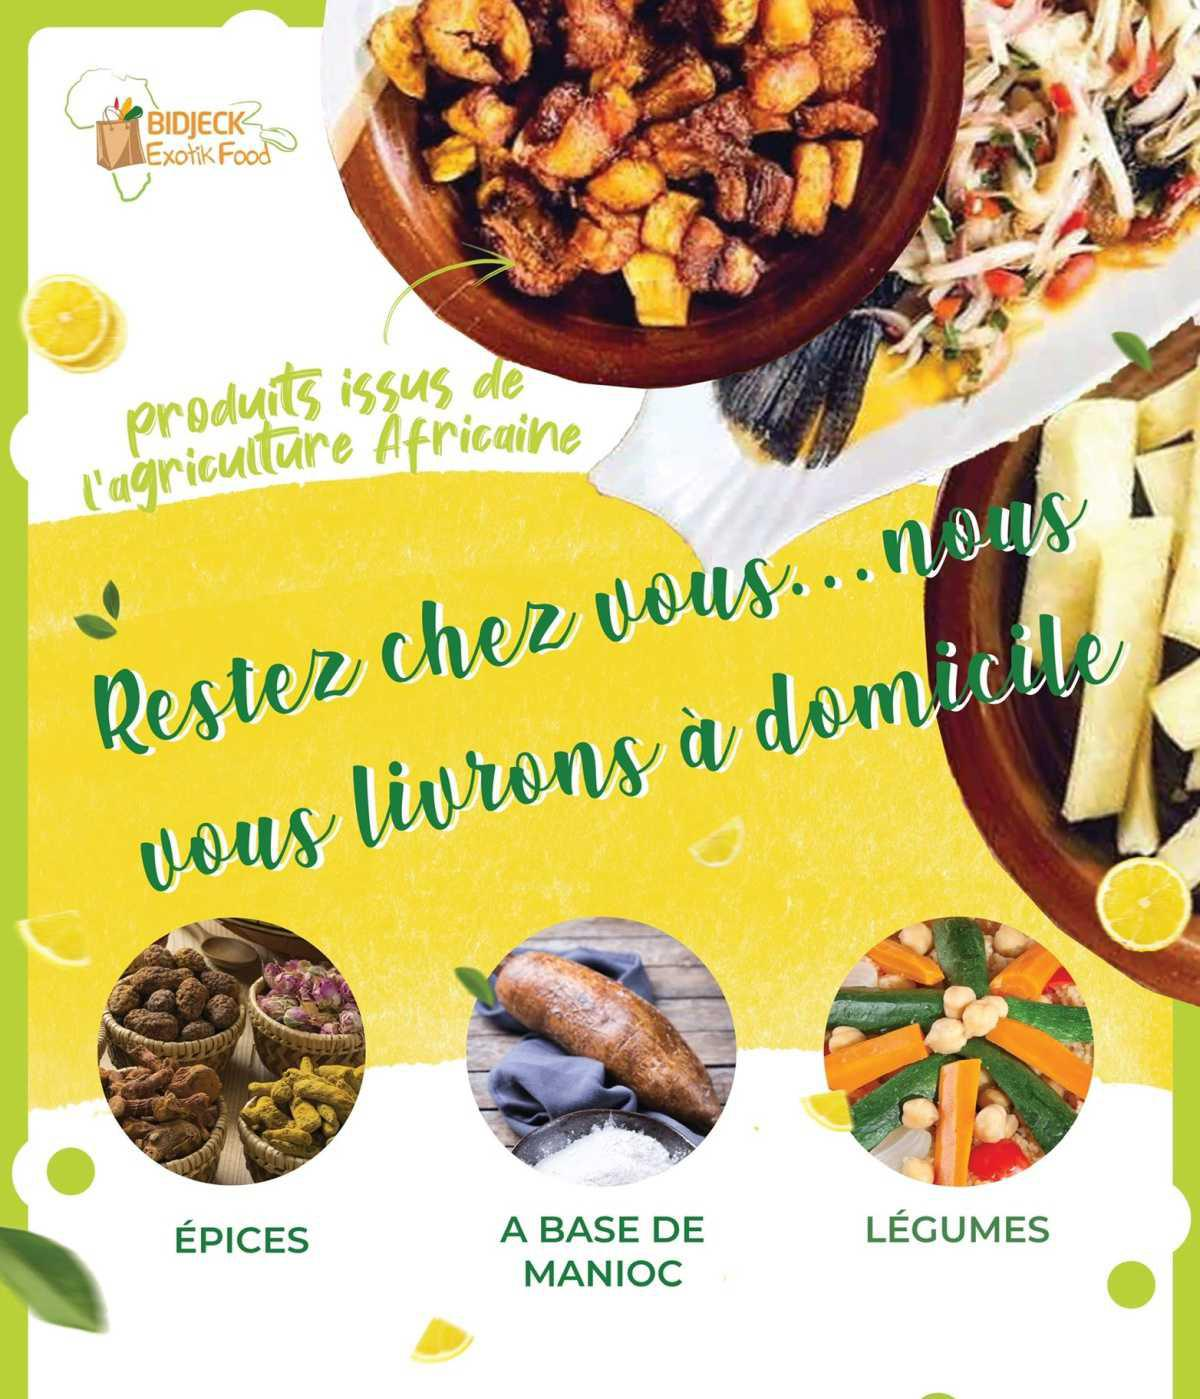 Epicerie | Bidjeck Exotik Food - 78140 Vélizy